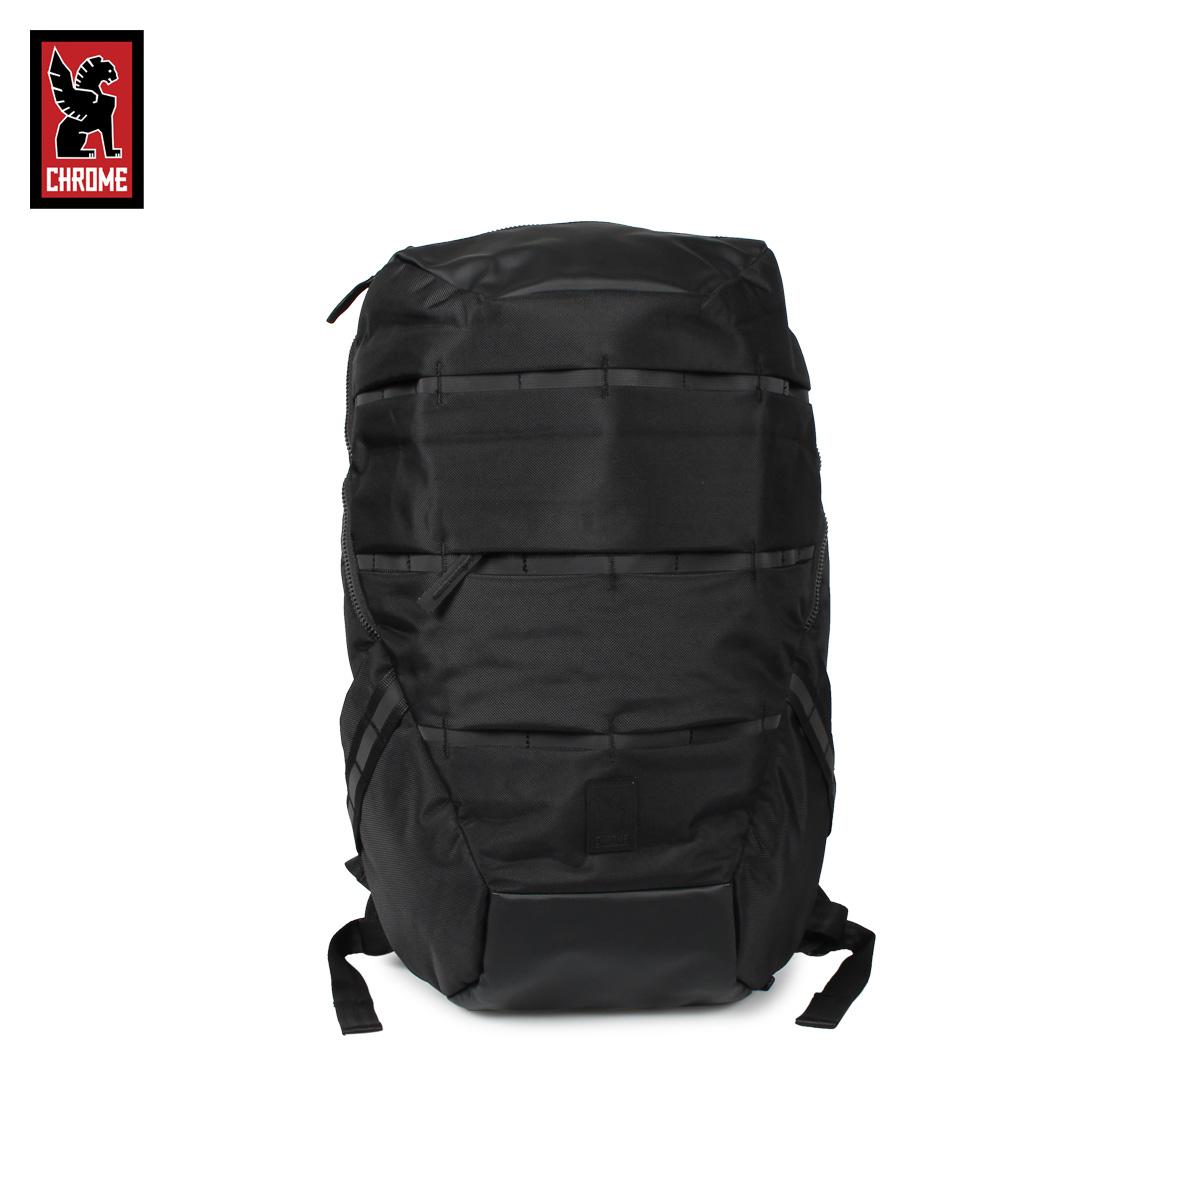 CHROME クローム ビジル パック リュック バッグ バックパック メンズ レディース MAZER VIGIL PACK ブラック 黒 BG-280